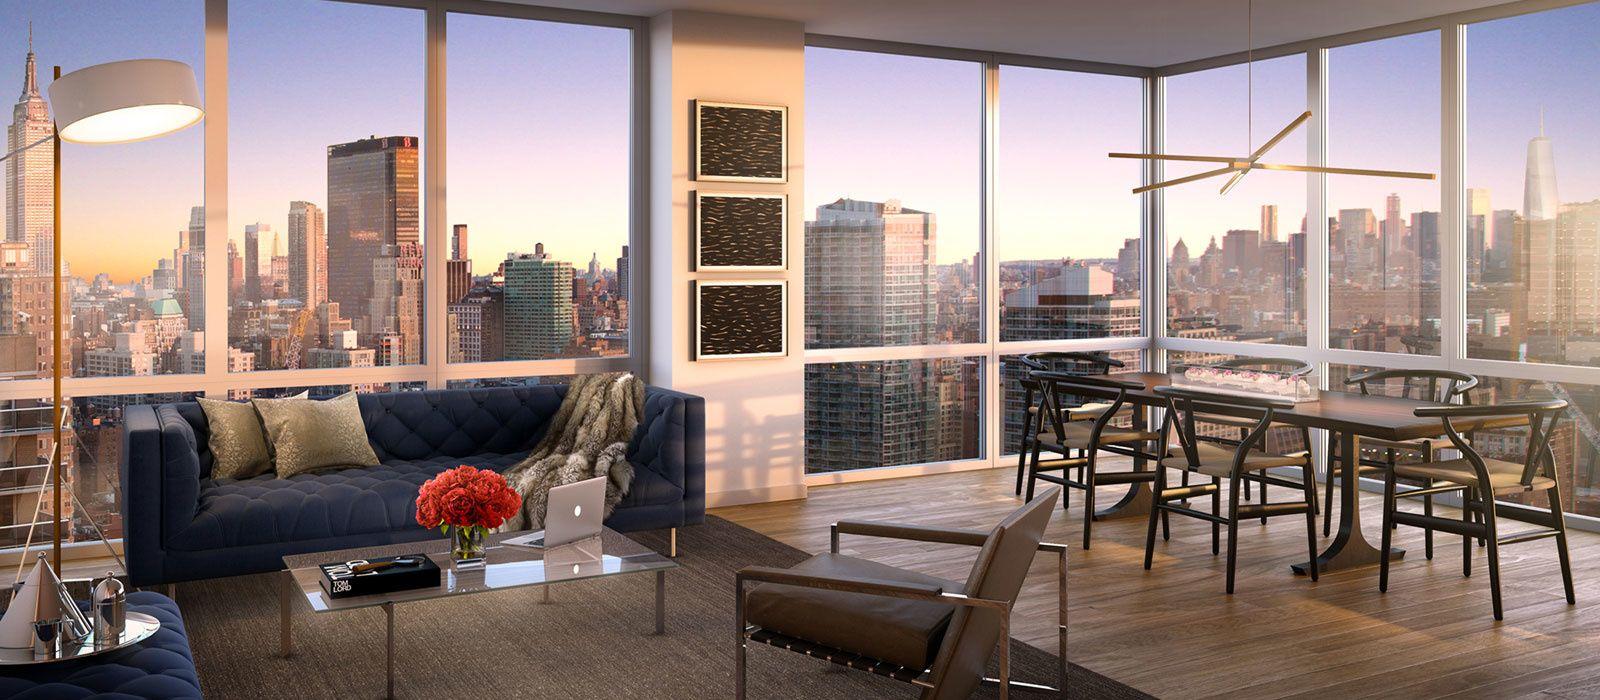 2 Bedroom Residences Manhattan Nyc Apartments For Sale Residential Apartments Condos For Sale